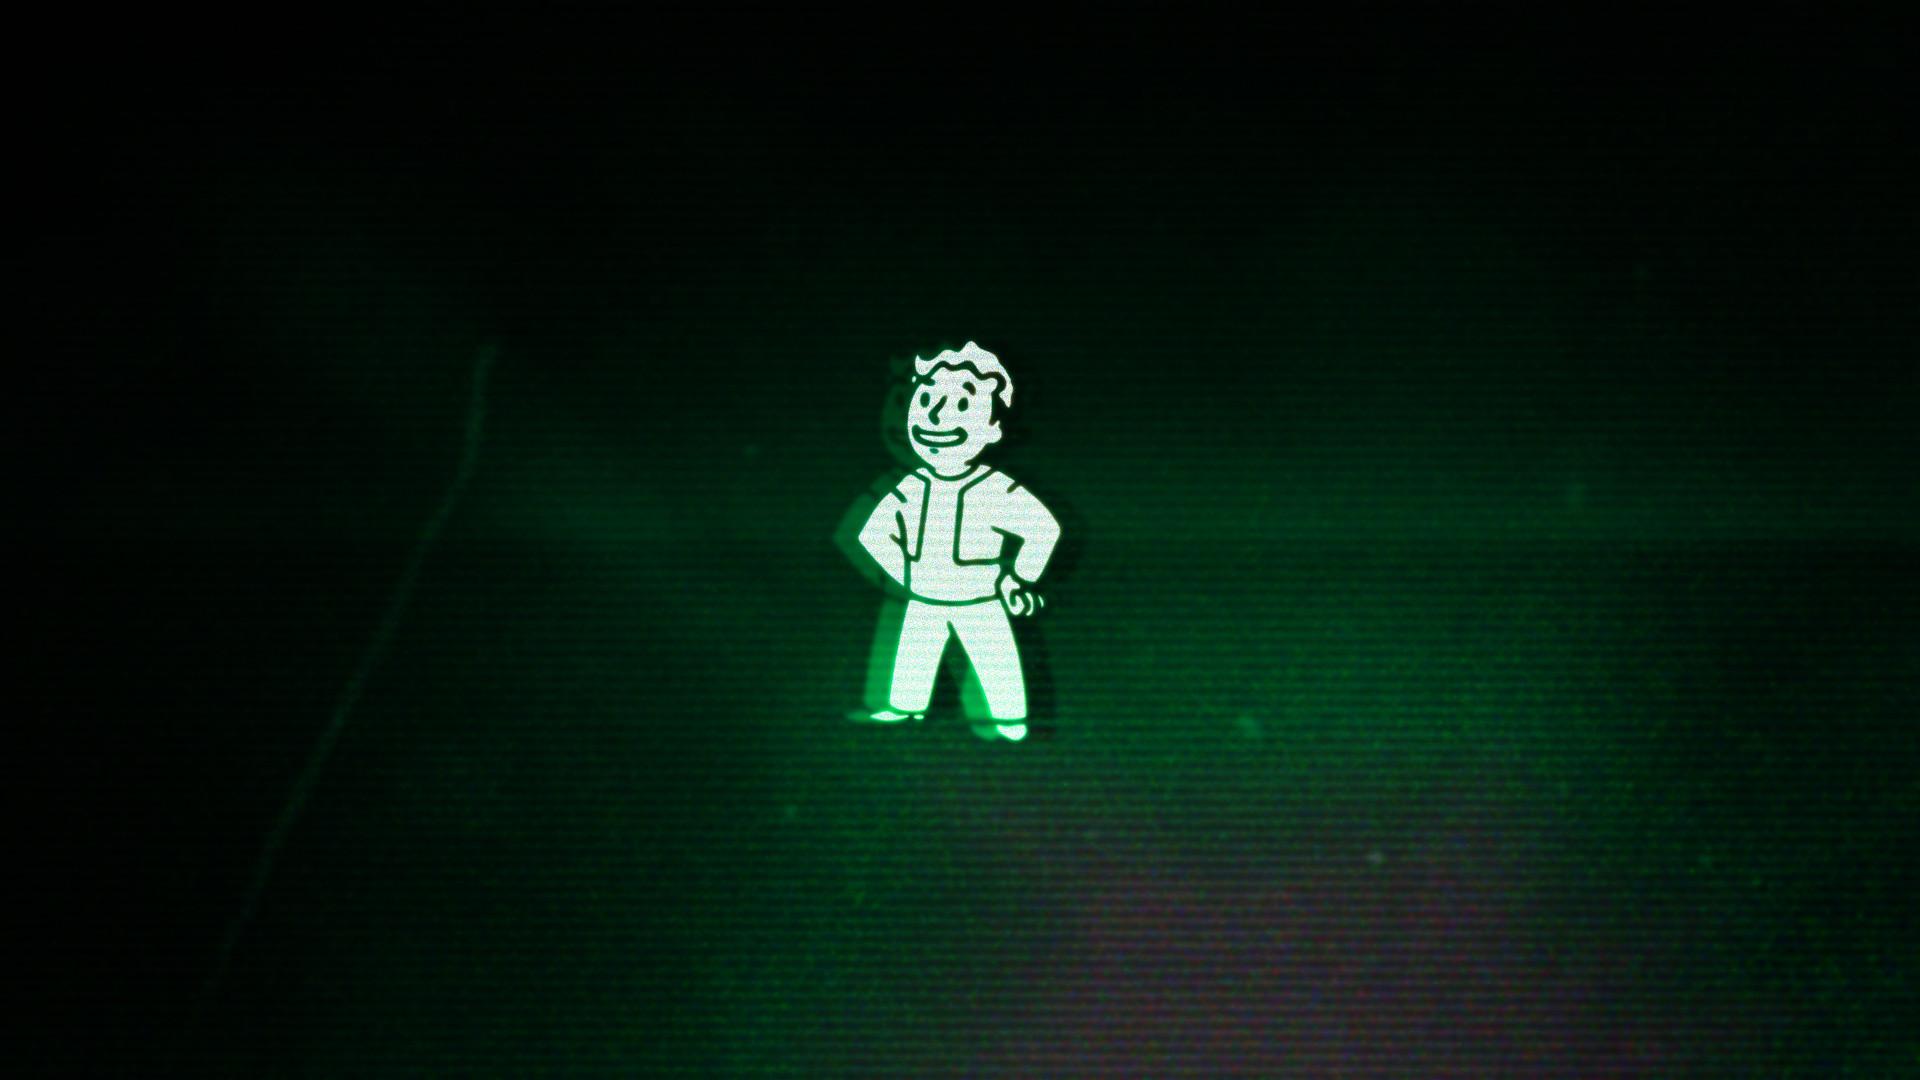 fallout pip boy background – Pesquisa Google